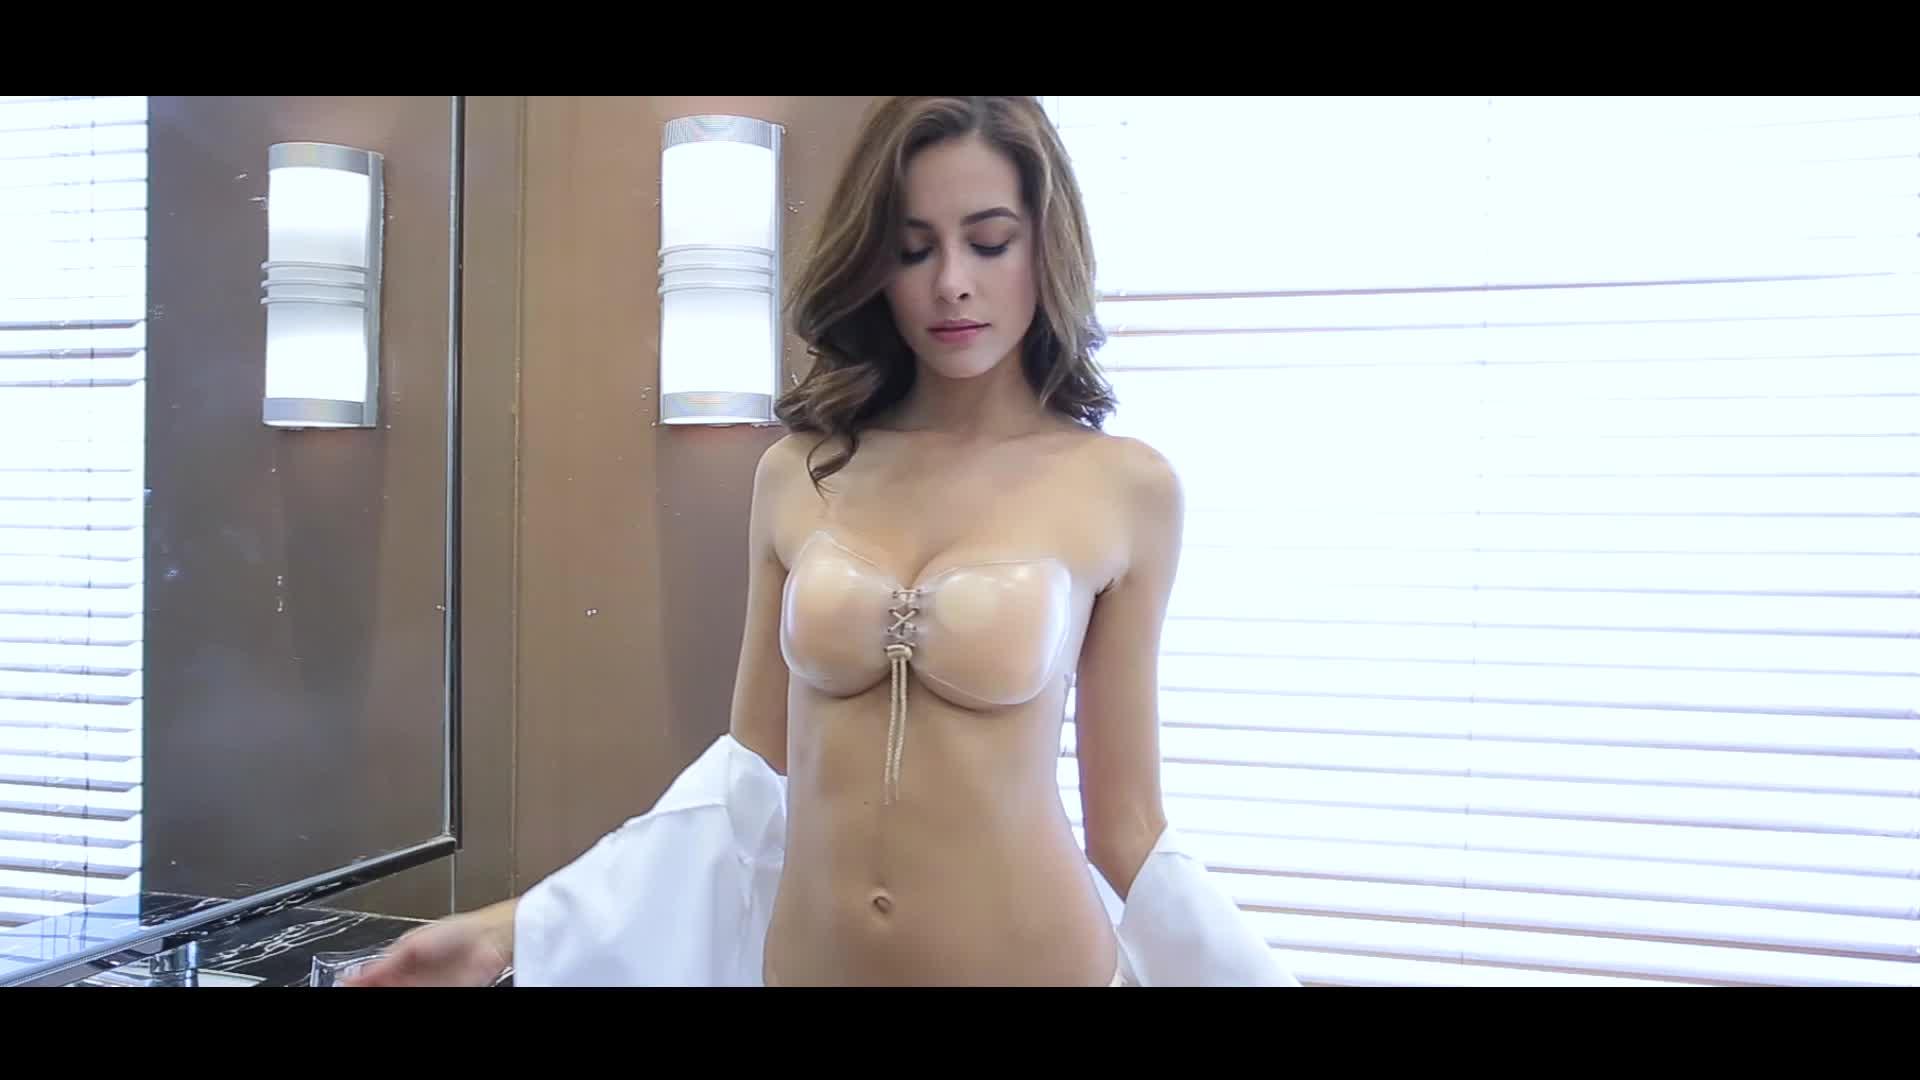 Women open cup bra sexy photos black silicone straps bra